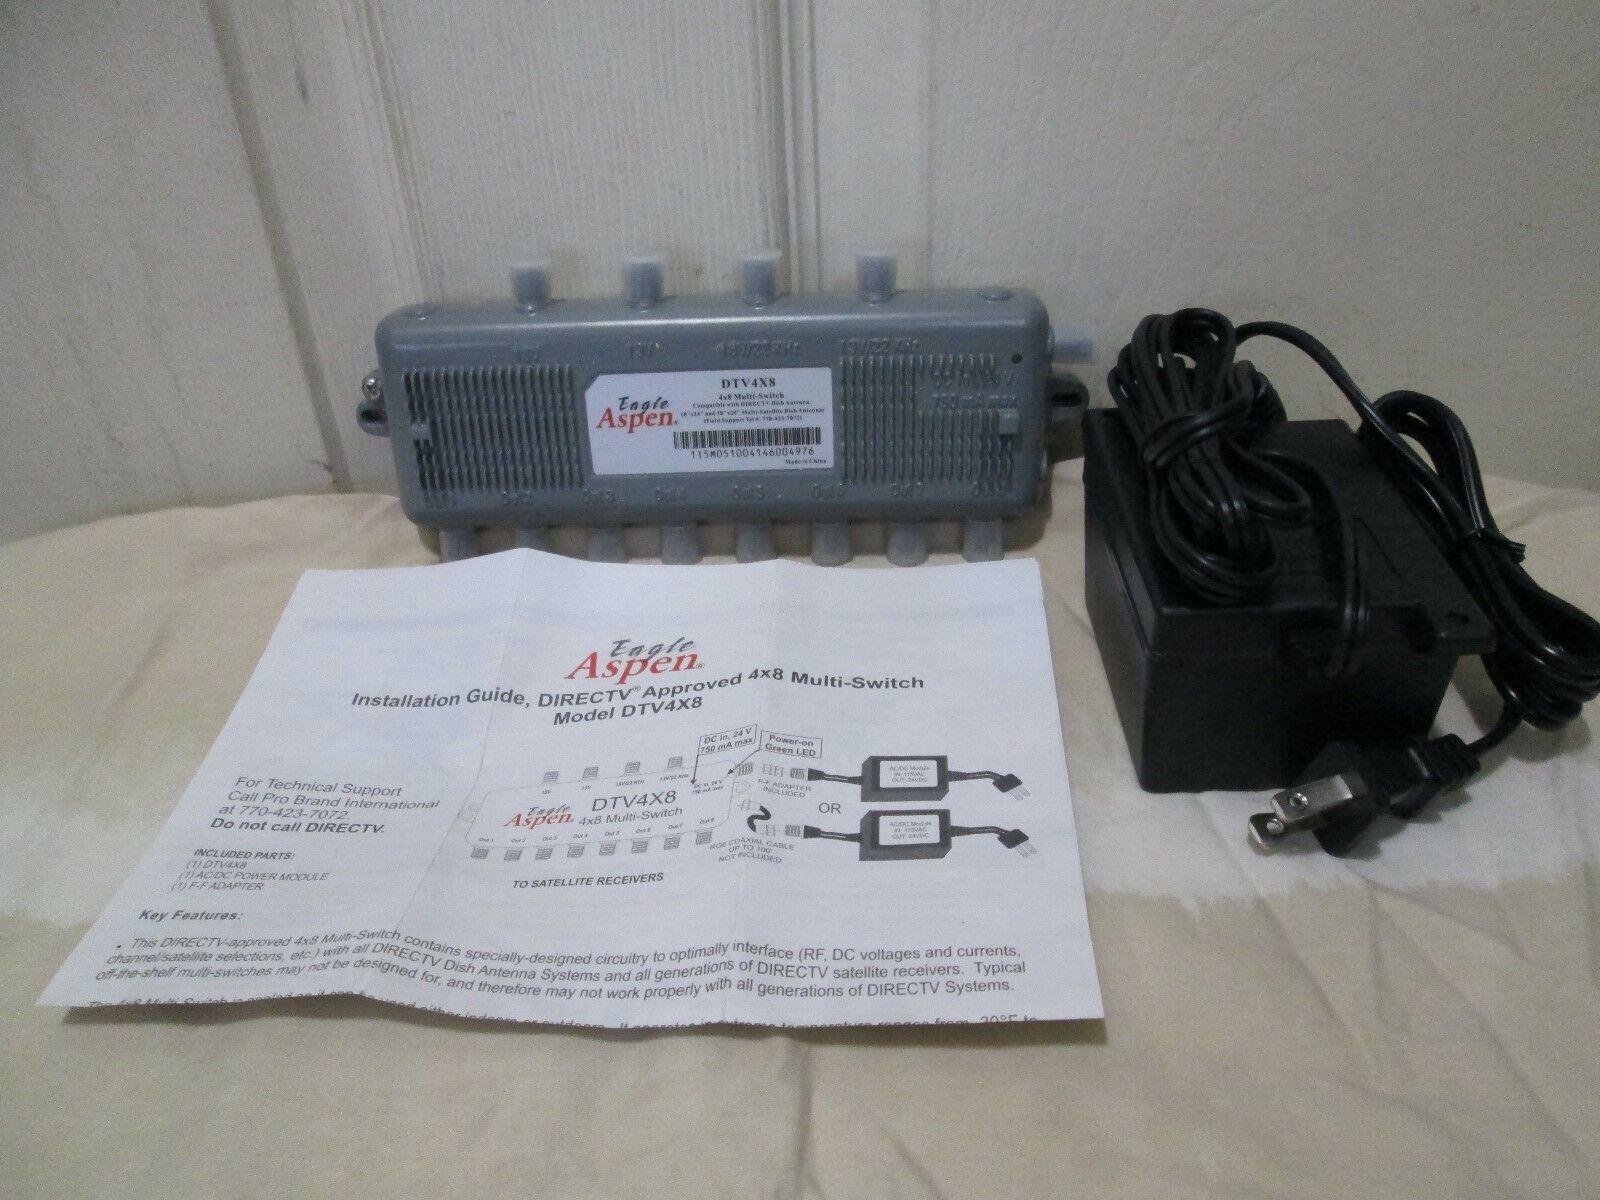 EAGLE ASPEN DTV 4X8 DIRECT TV MULTI SWITCH W/ POWER CORD Satellite ...